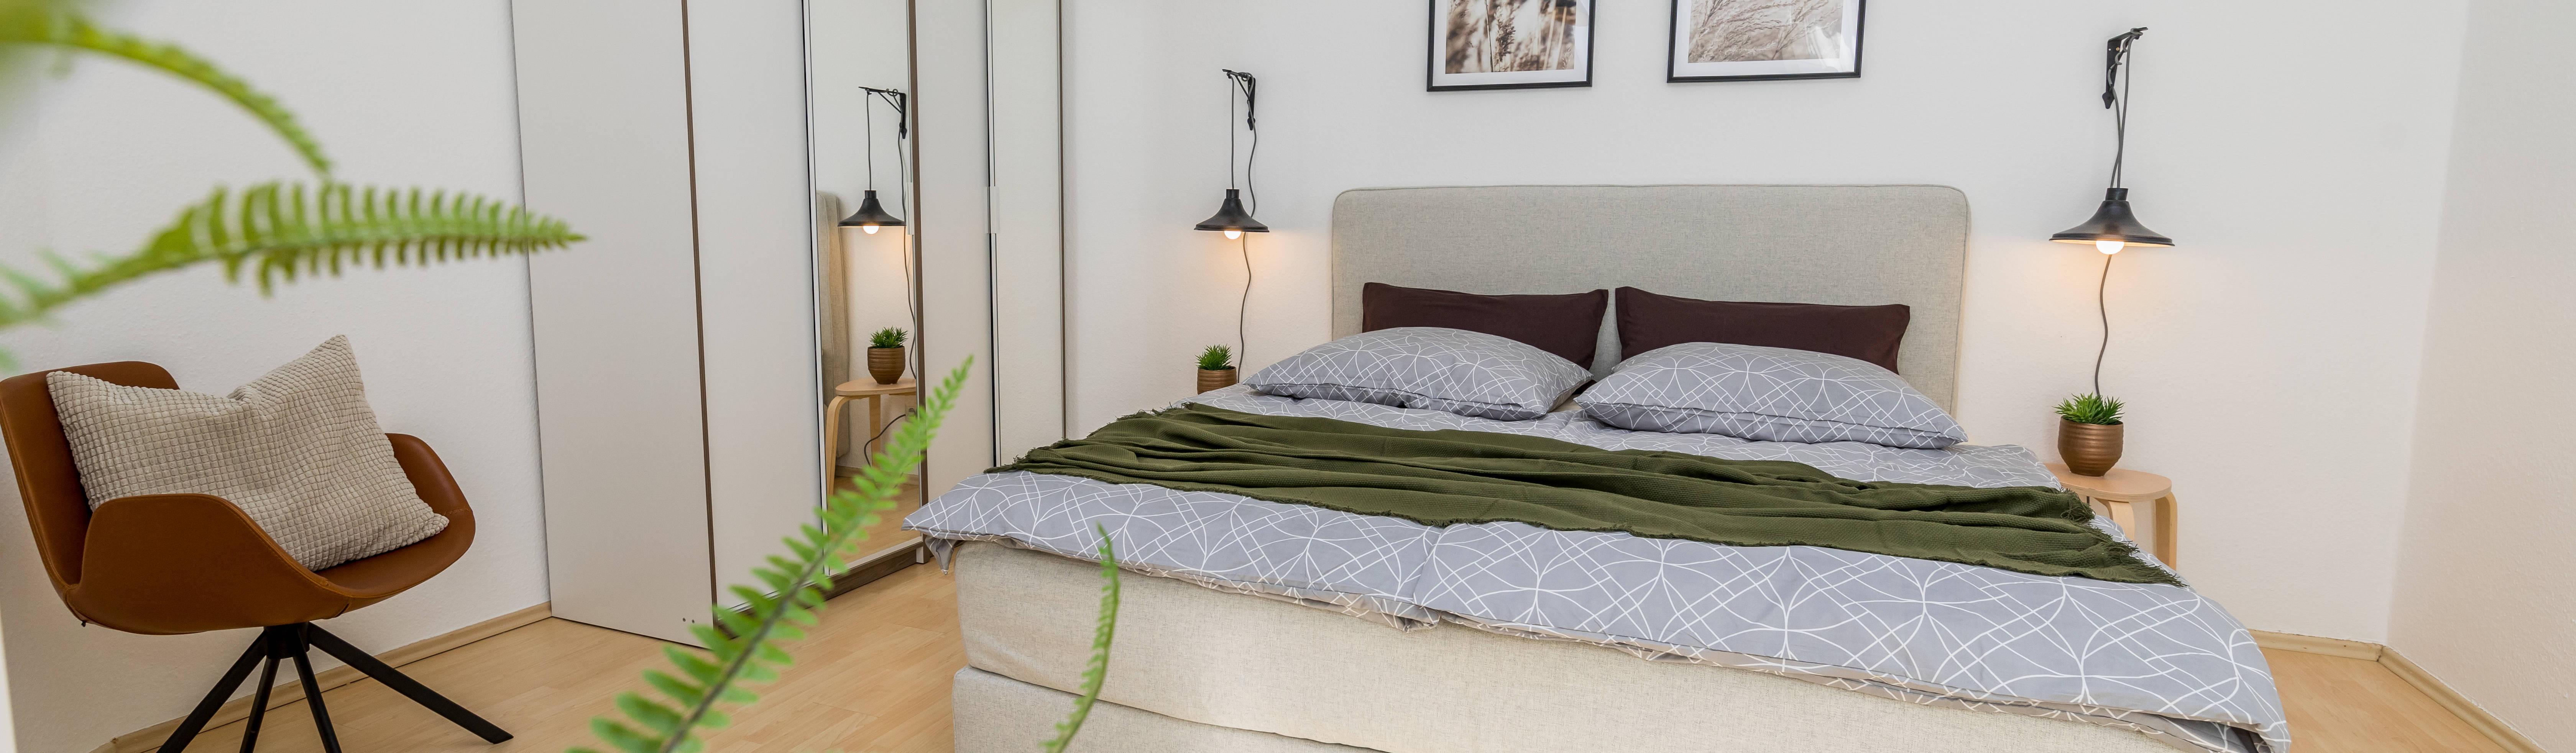 Wohnjuwel Home Staging